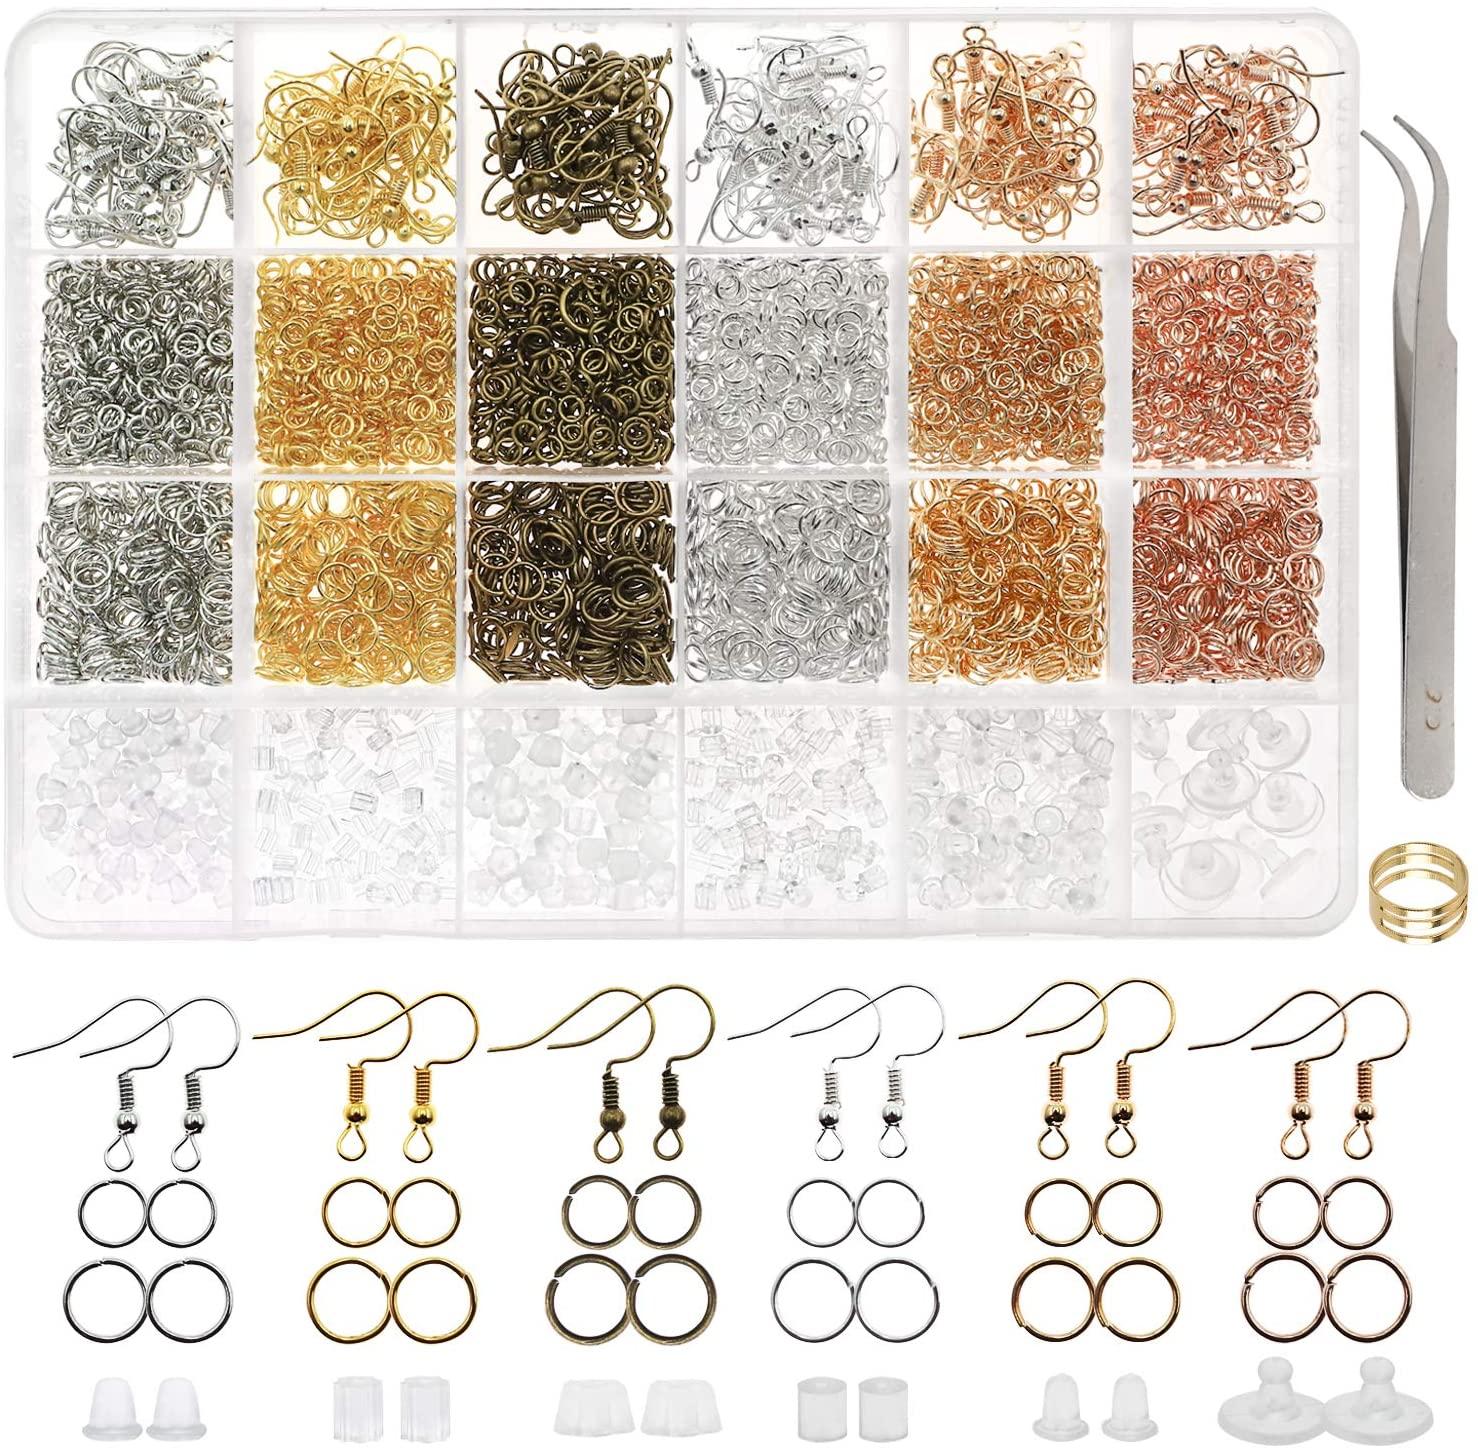 DICOBD 3700pcs Earring Making Supplies Kit with 6 Colors Earring Hooks, Jump Rings, Earring Post Earrings Making and Repairing